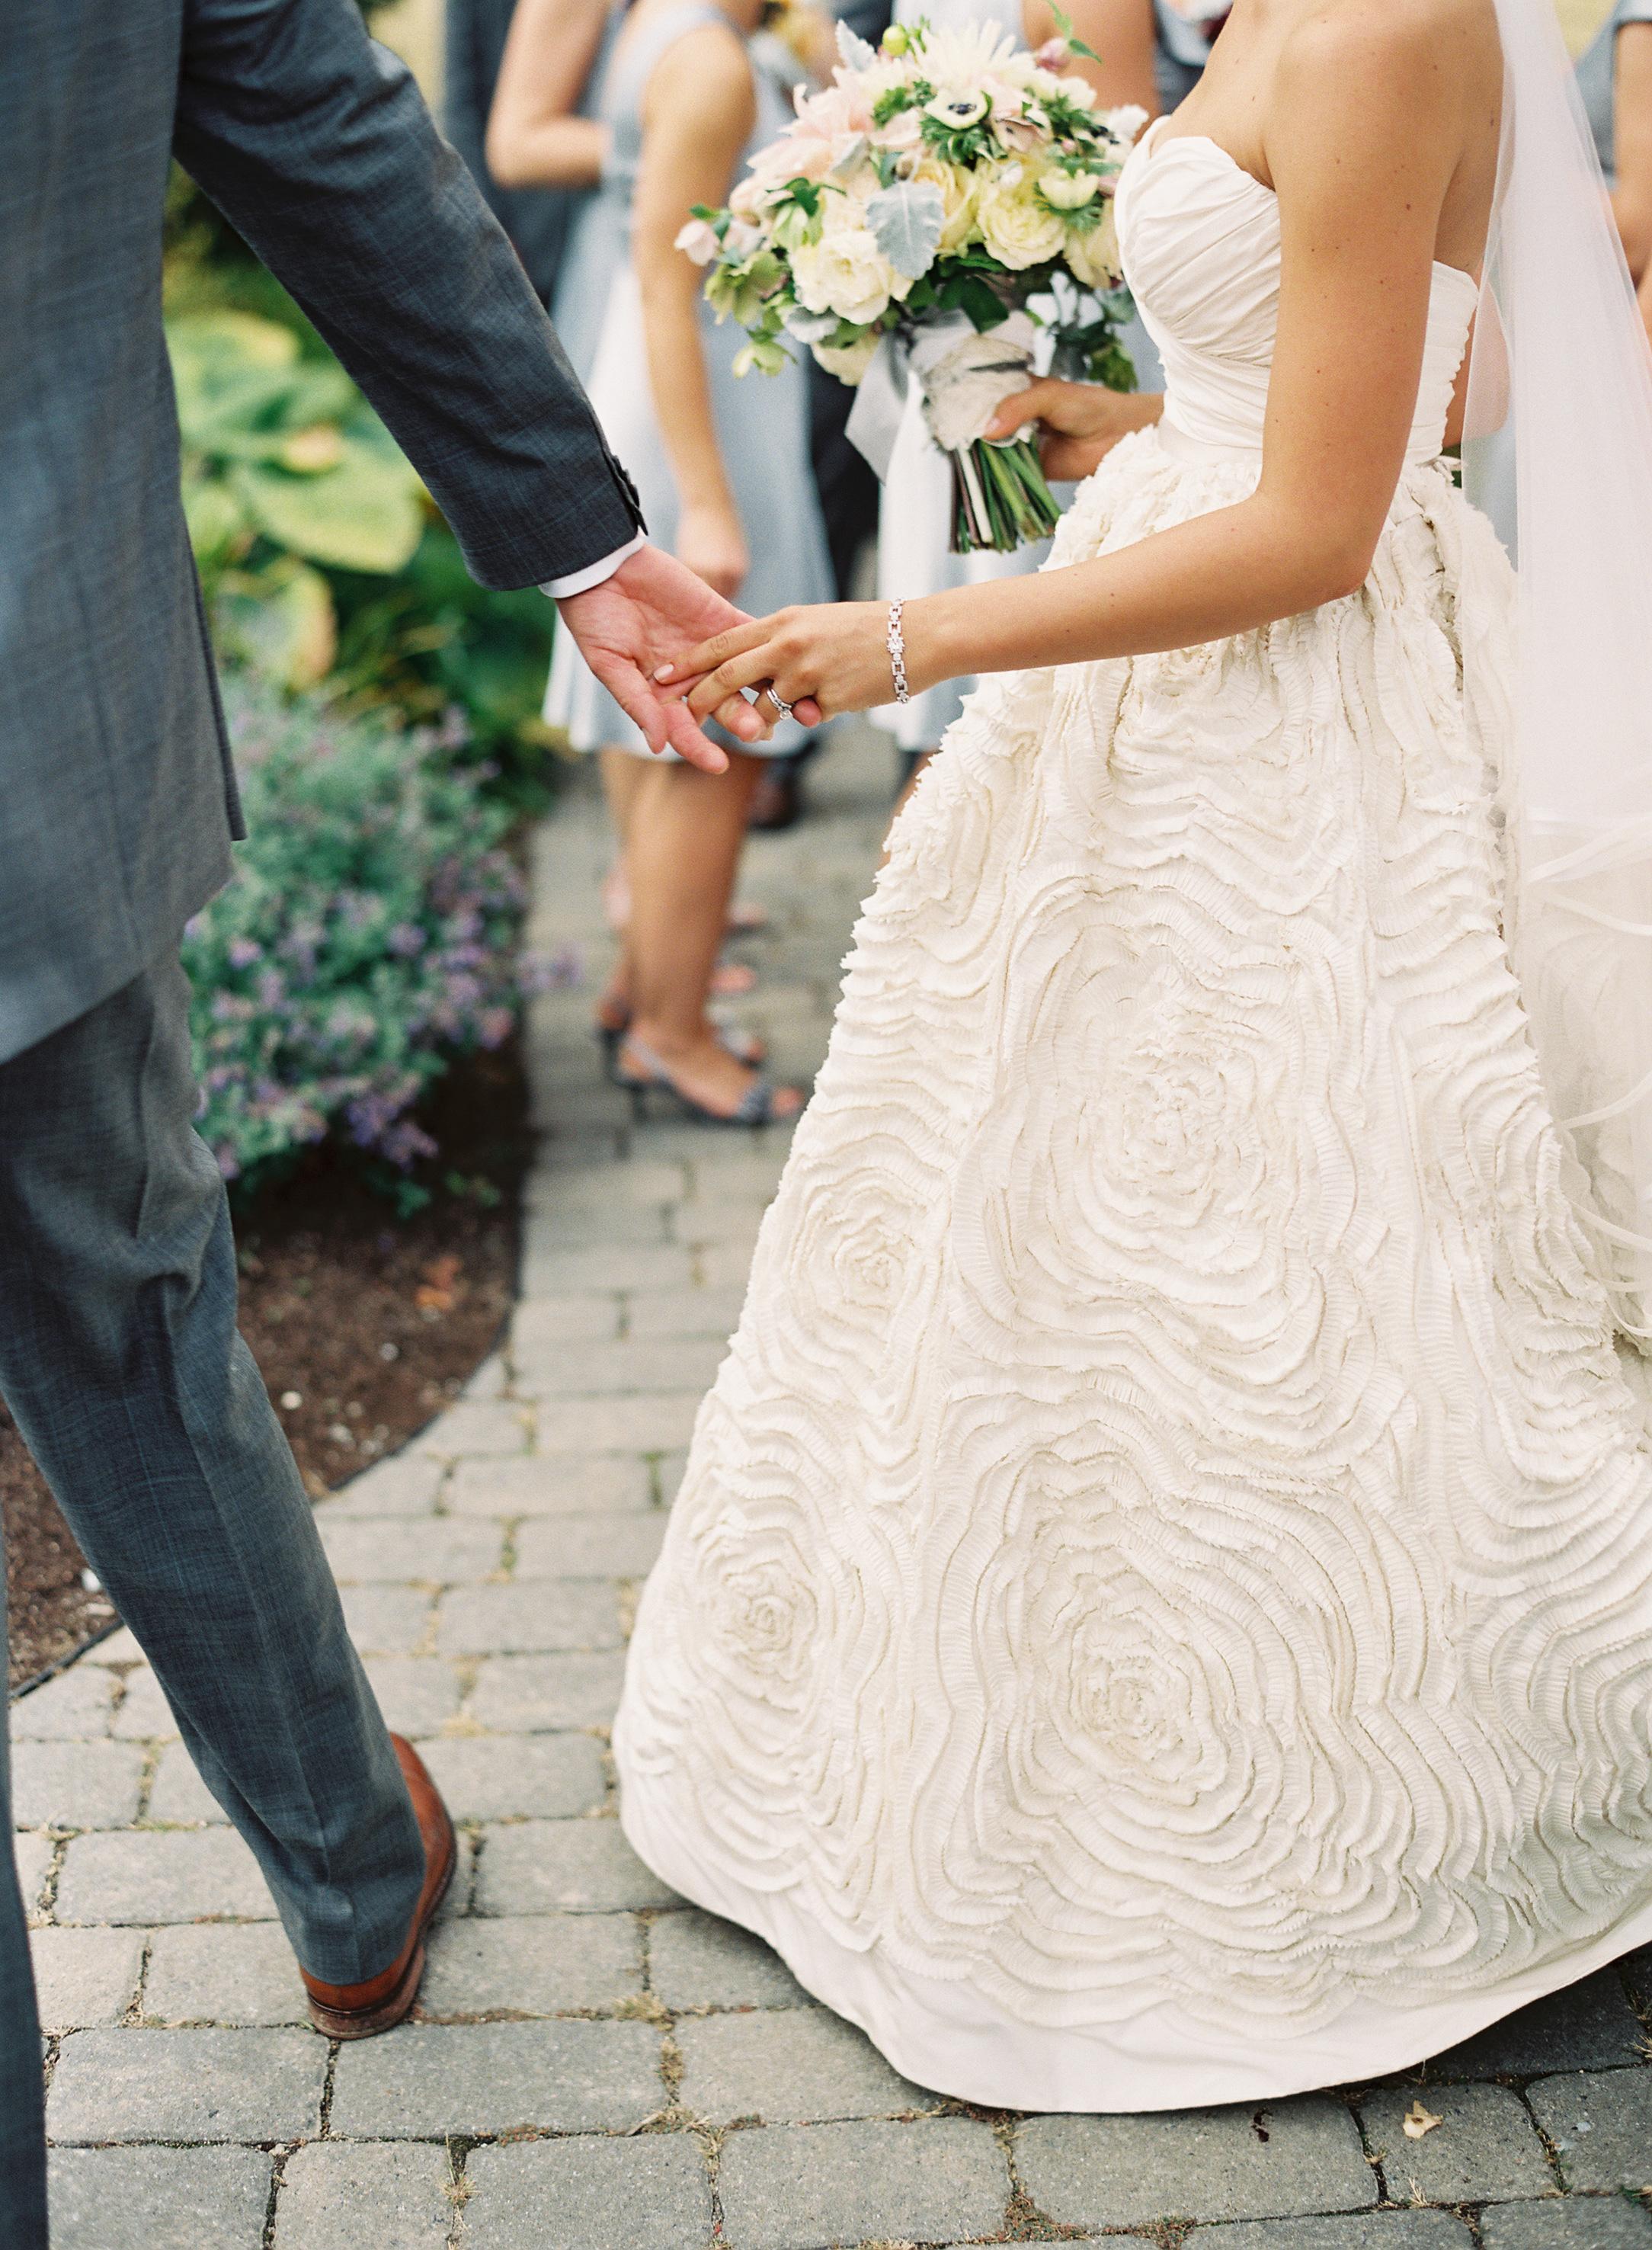 chebeague_island_inn_wedding_gabe_aceves015.JPG